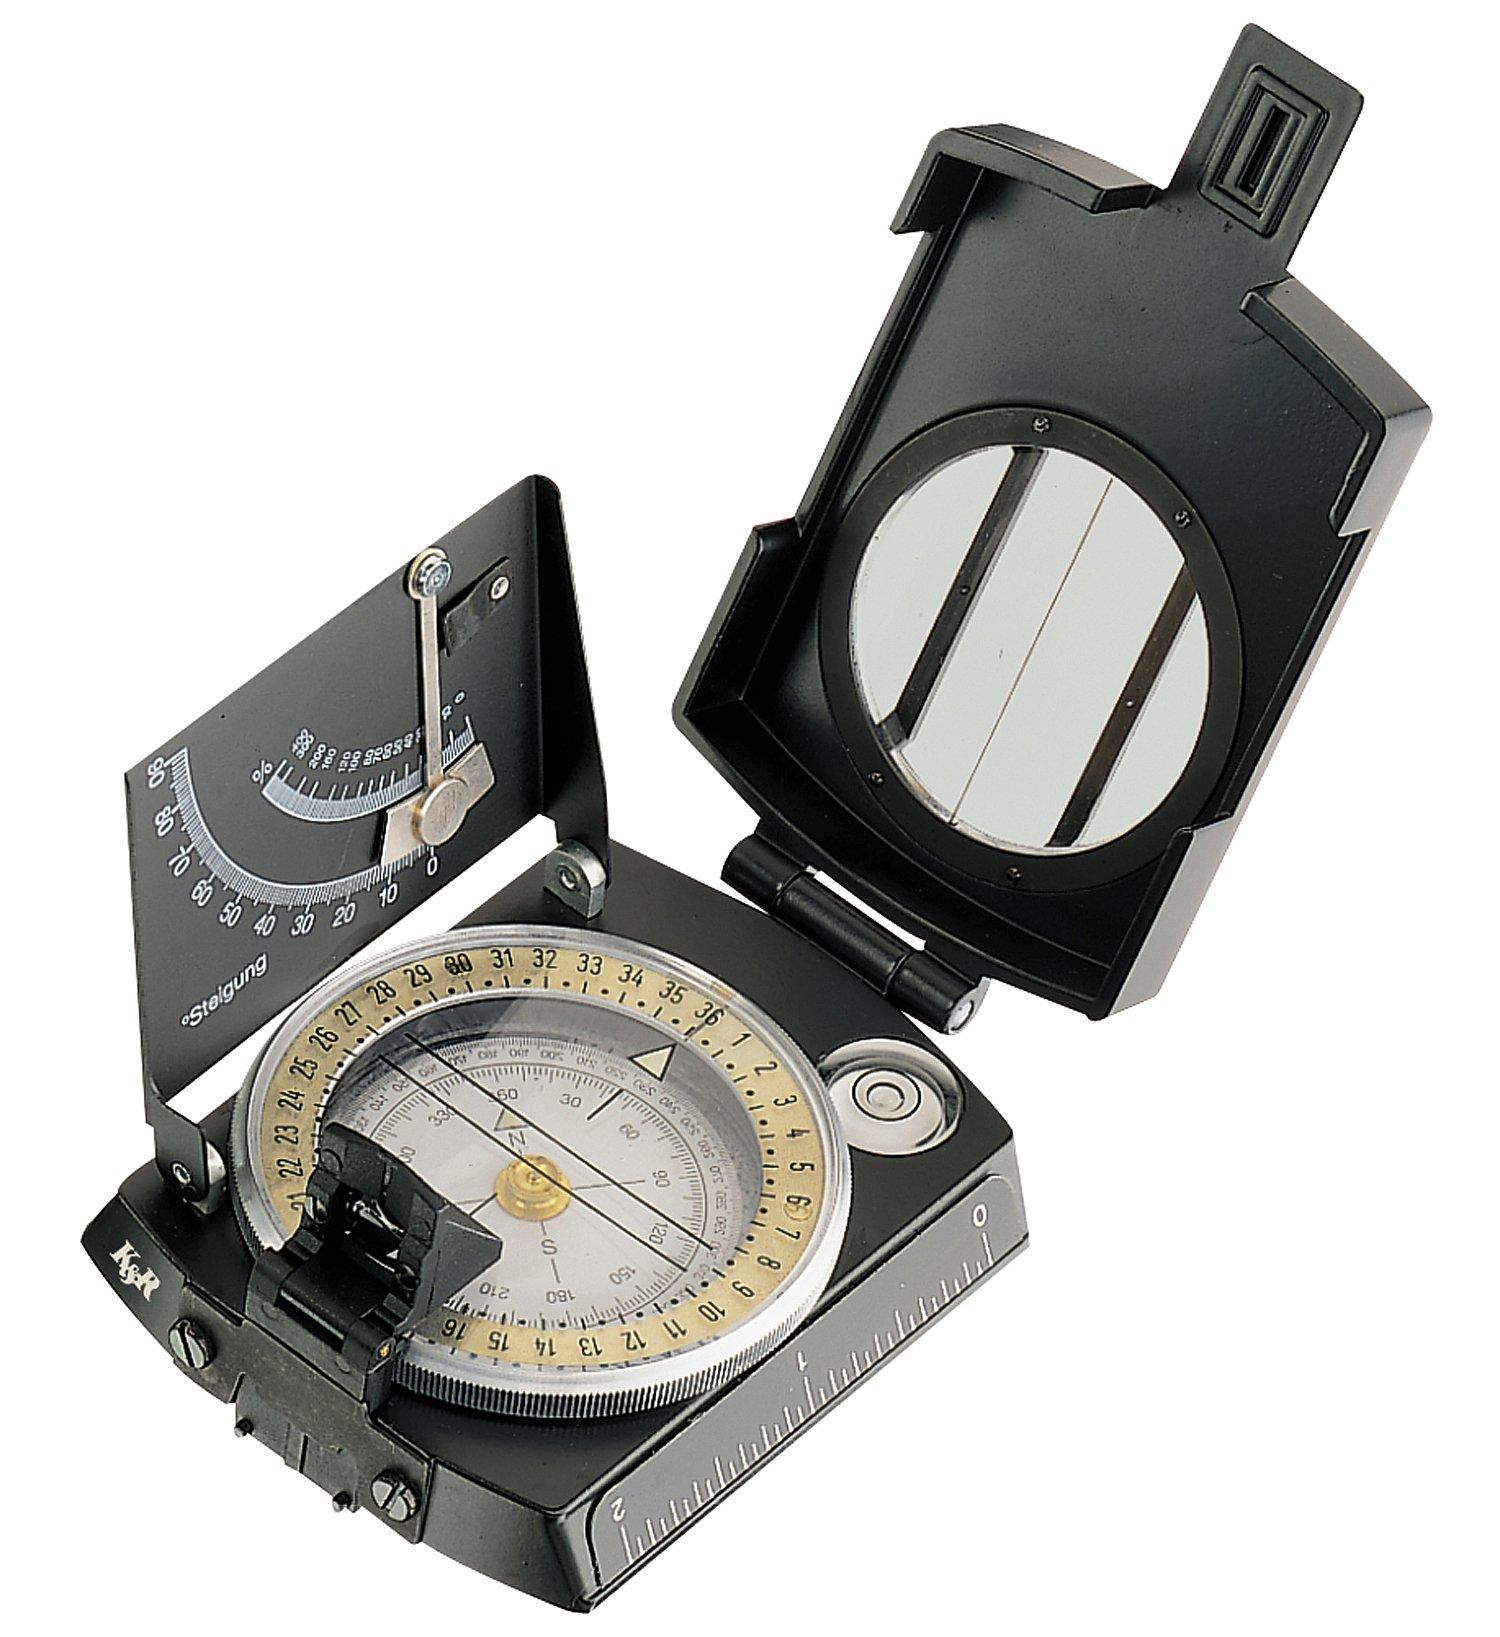 K&R Meridian Pro Compass